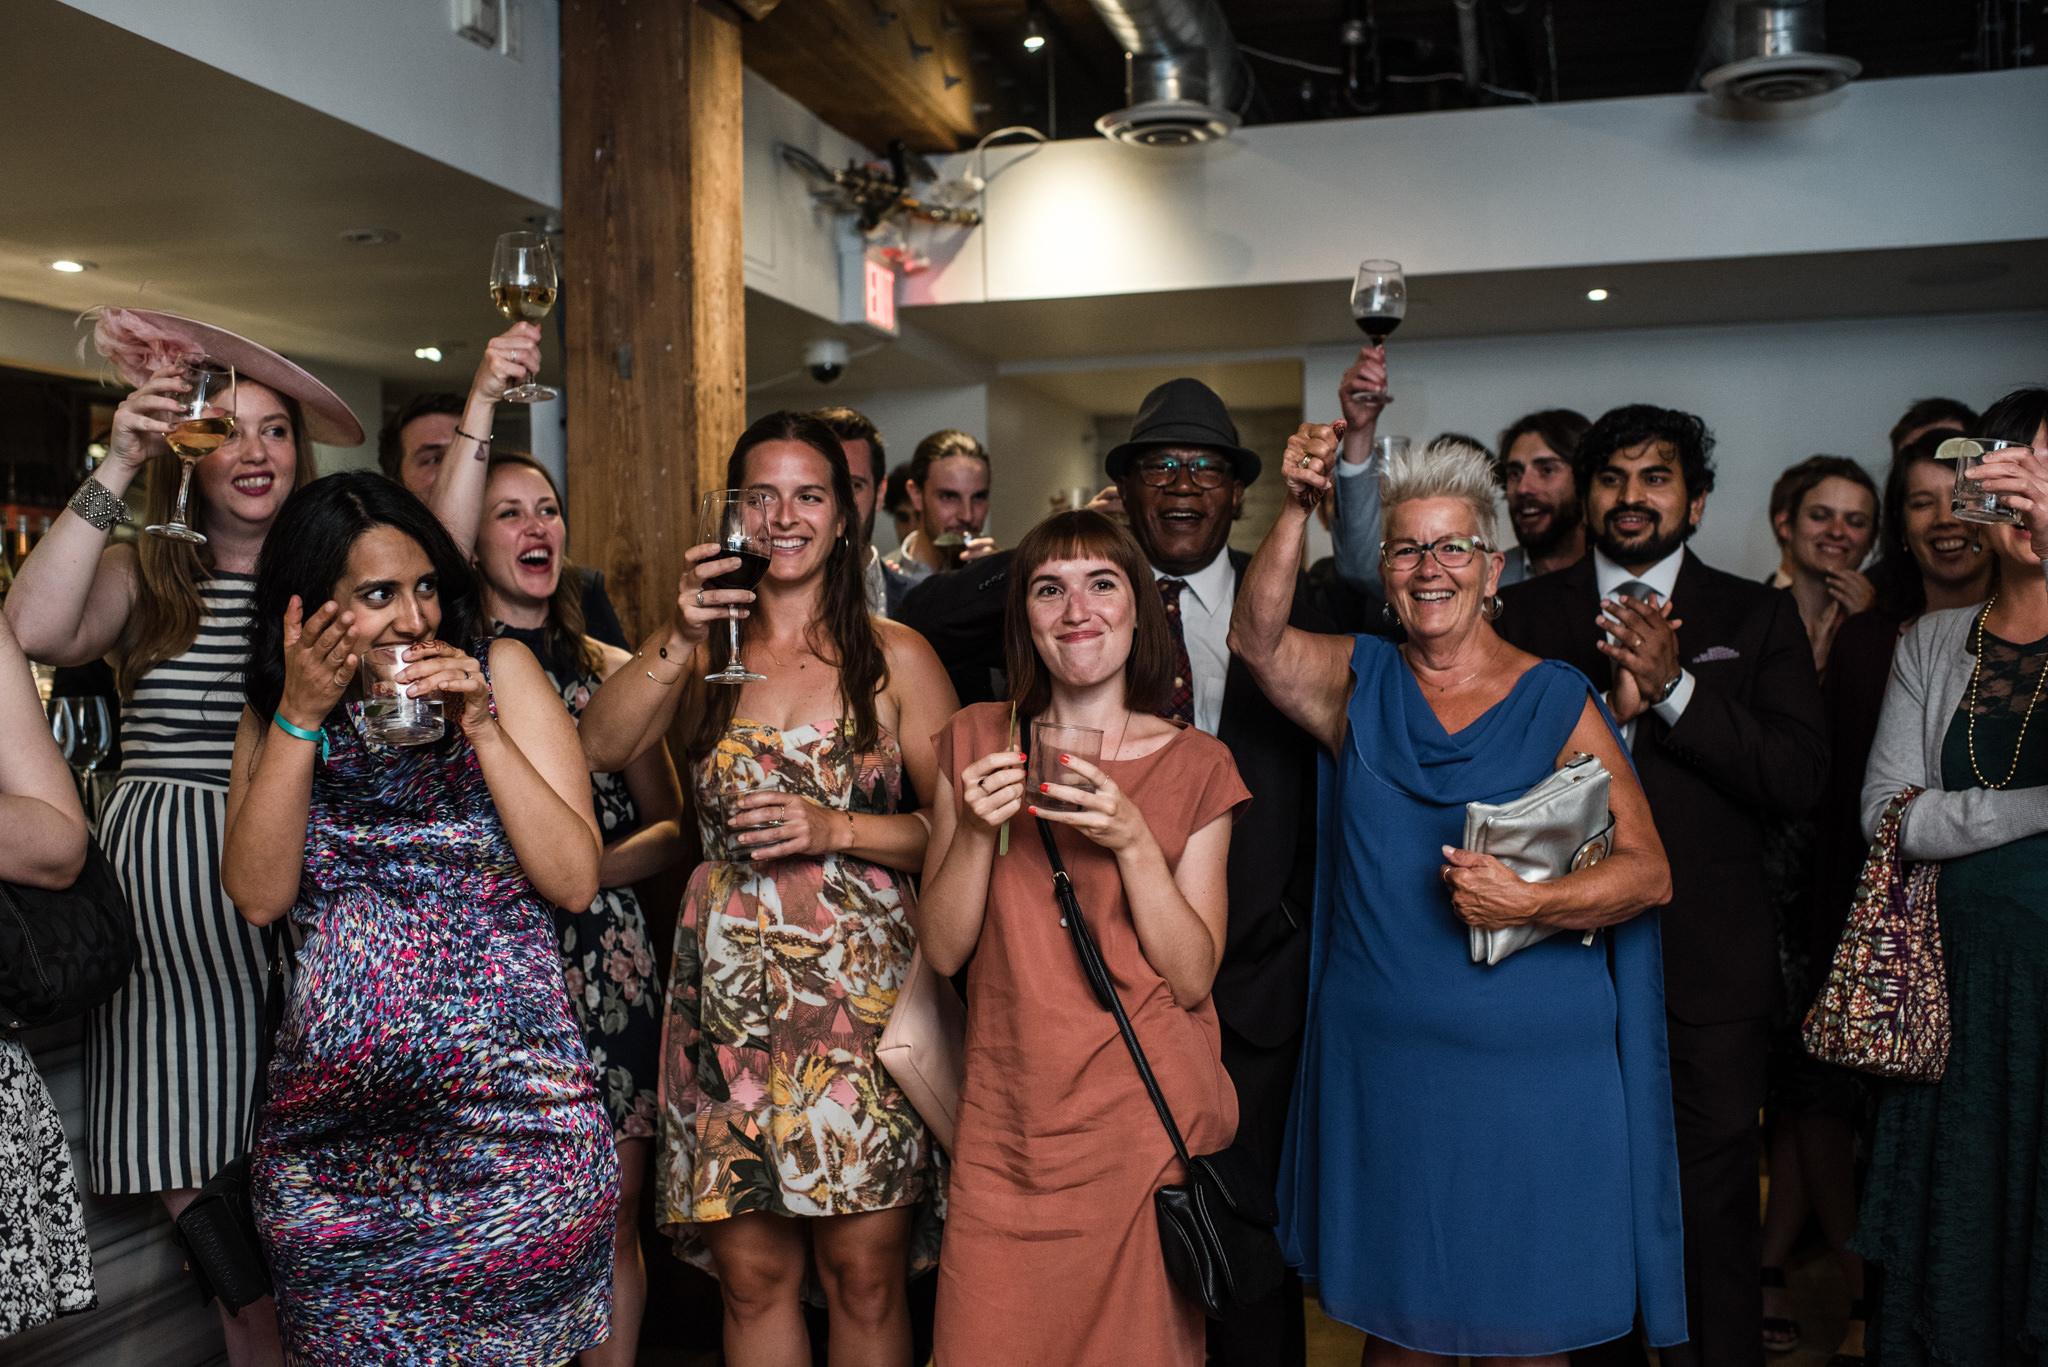 043-documentary-cocktail-reception-toronto-hotel-ocho-photography-wedding.jpg